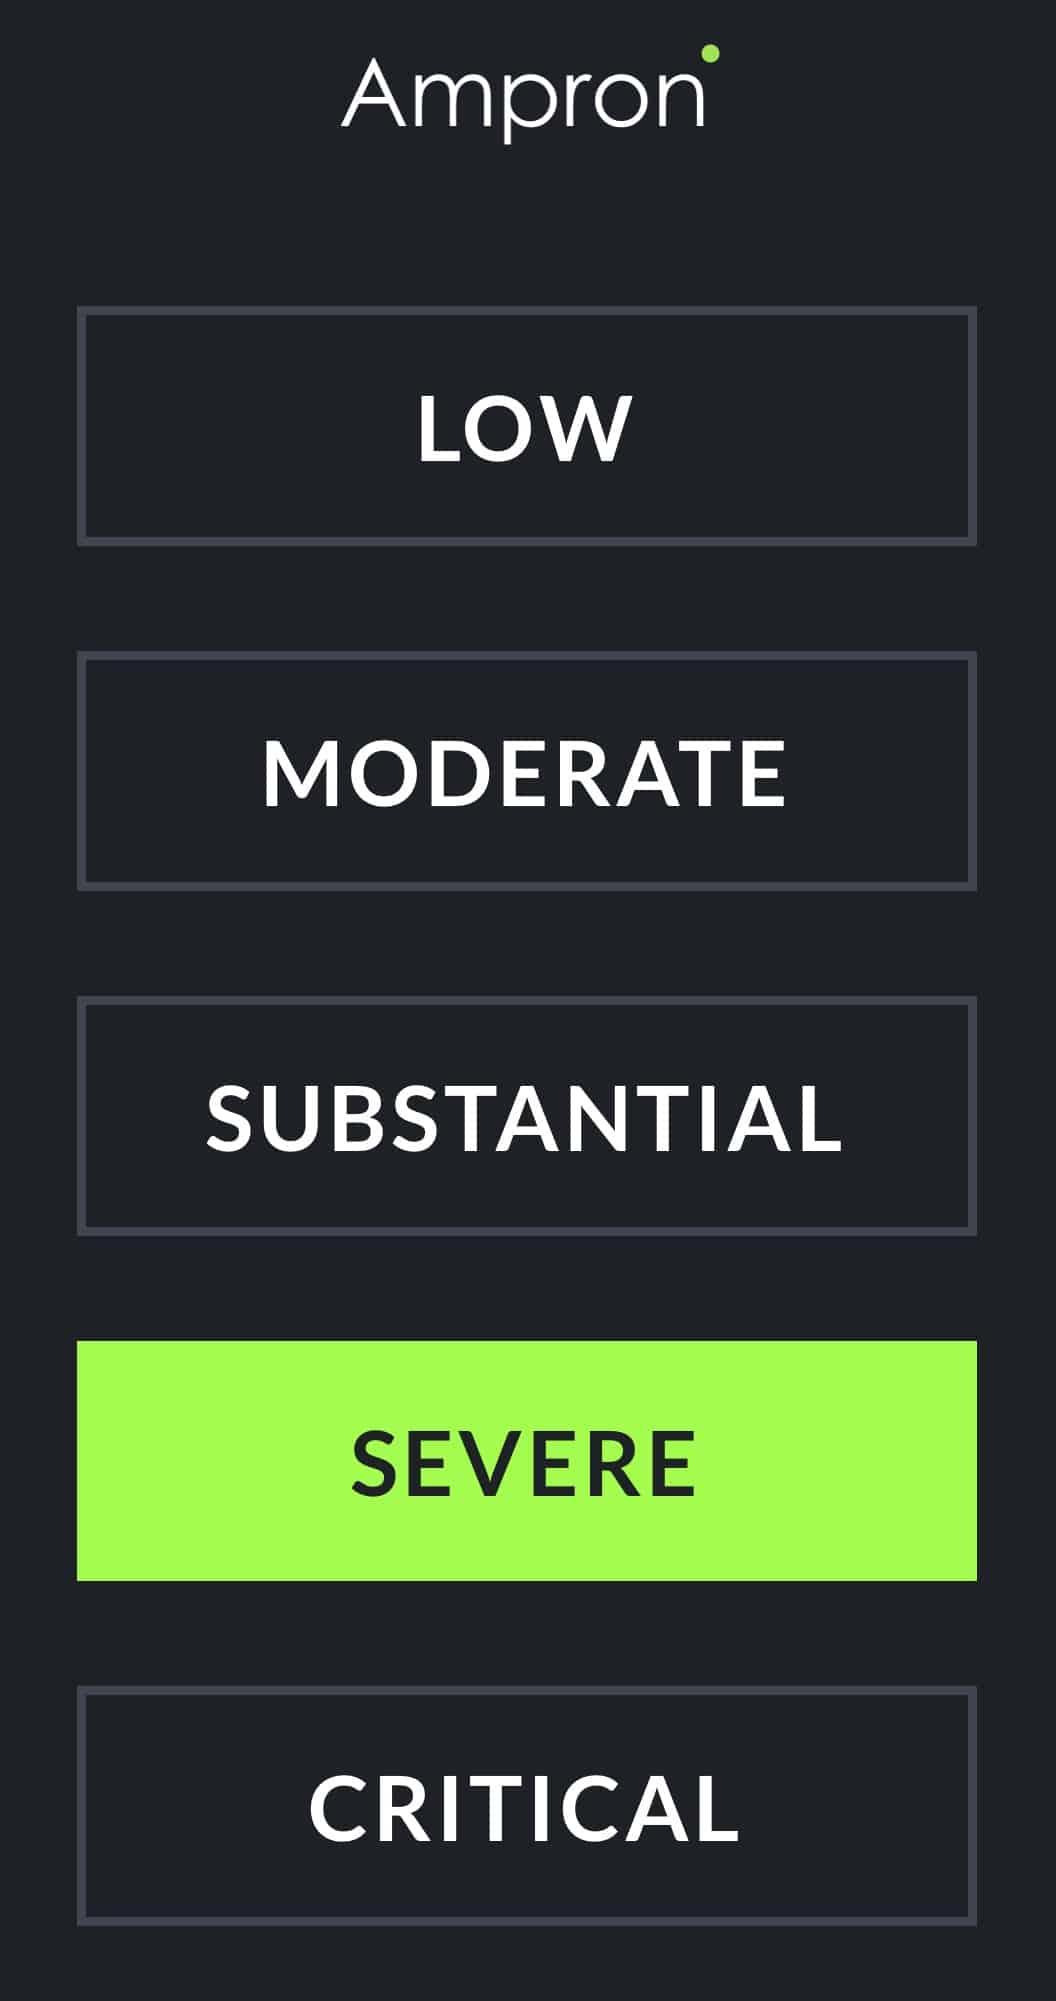 Ampron LED Message Board Threat Level Indicator Solution (UI) User Interface